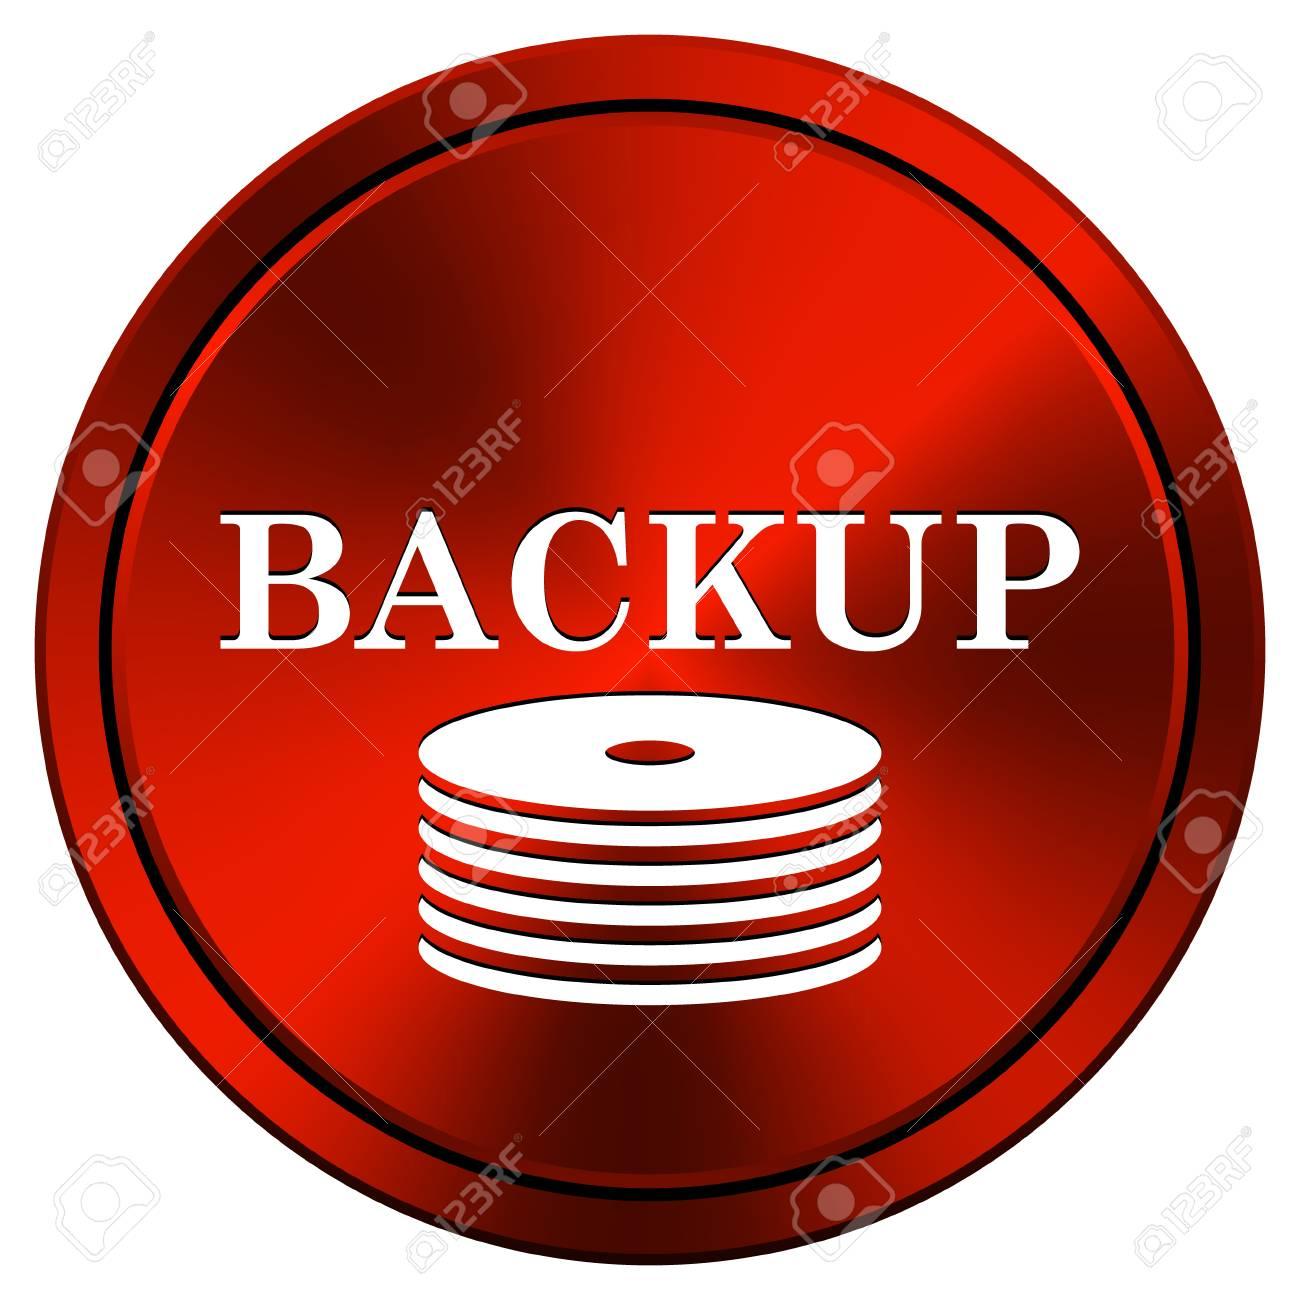 Metallic icon with white design on red  background Stock Photo - 23267651